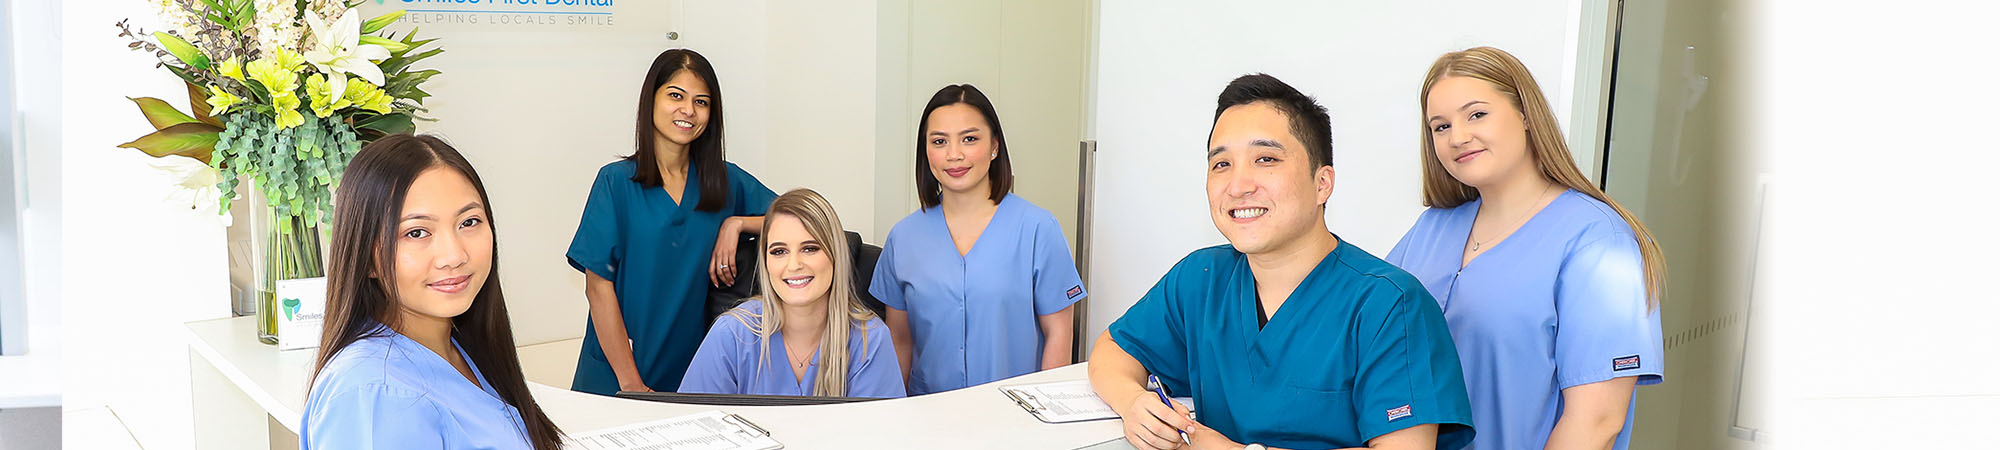 sf dental team